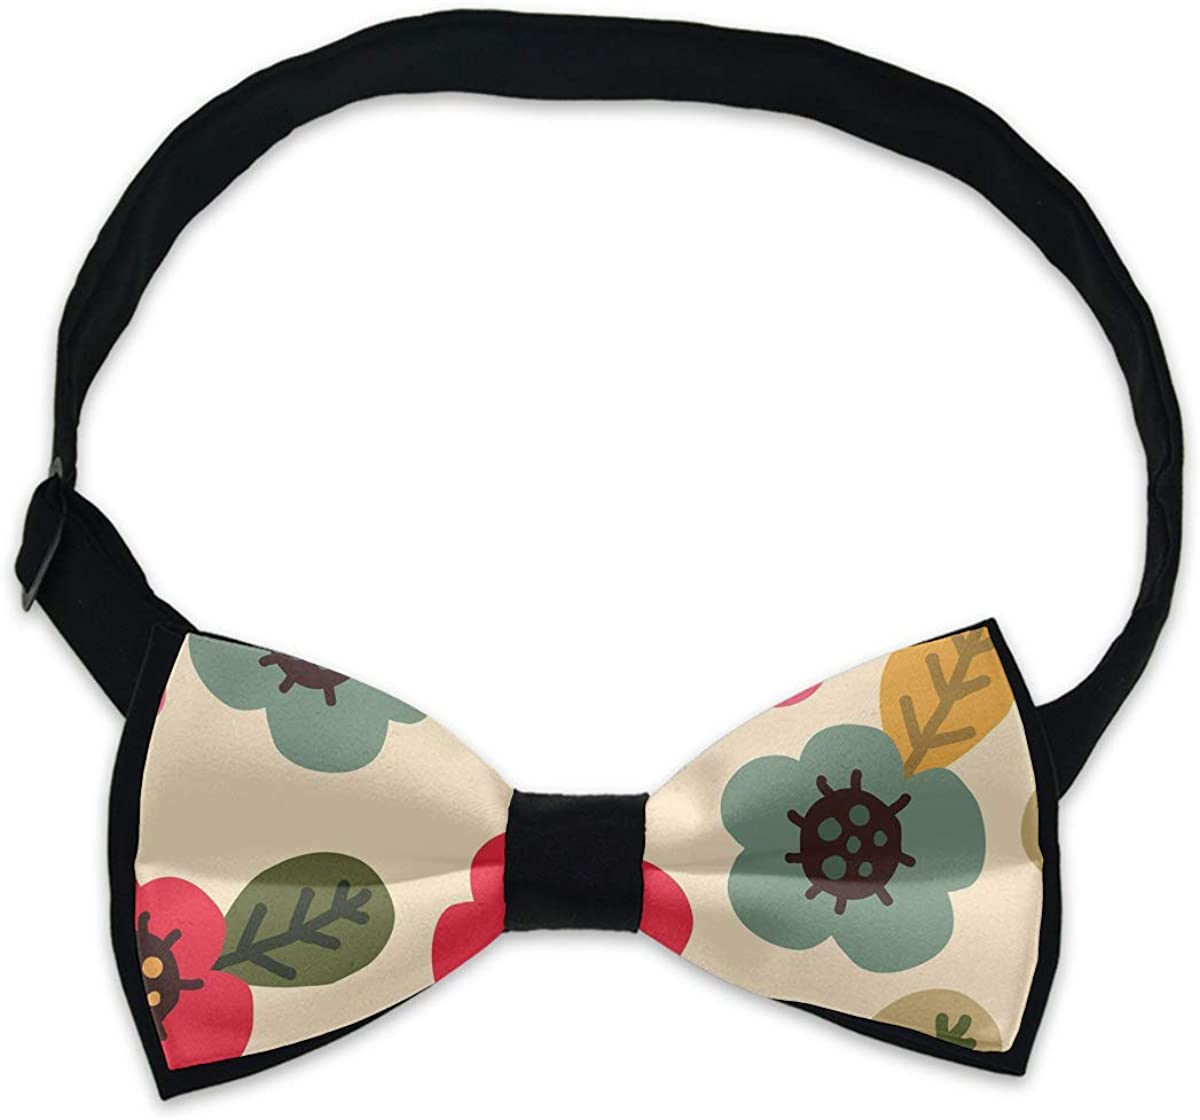 Bowtie, Adjustable Bowties Wedding Party, Formal Events, Fancy Plain Necktie